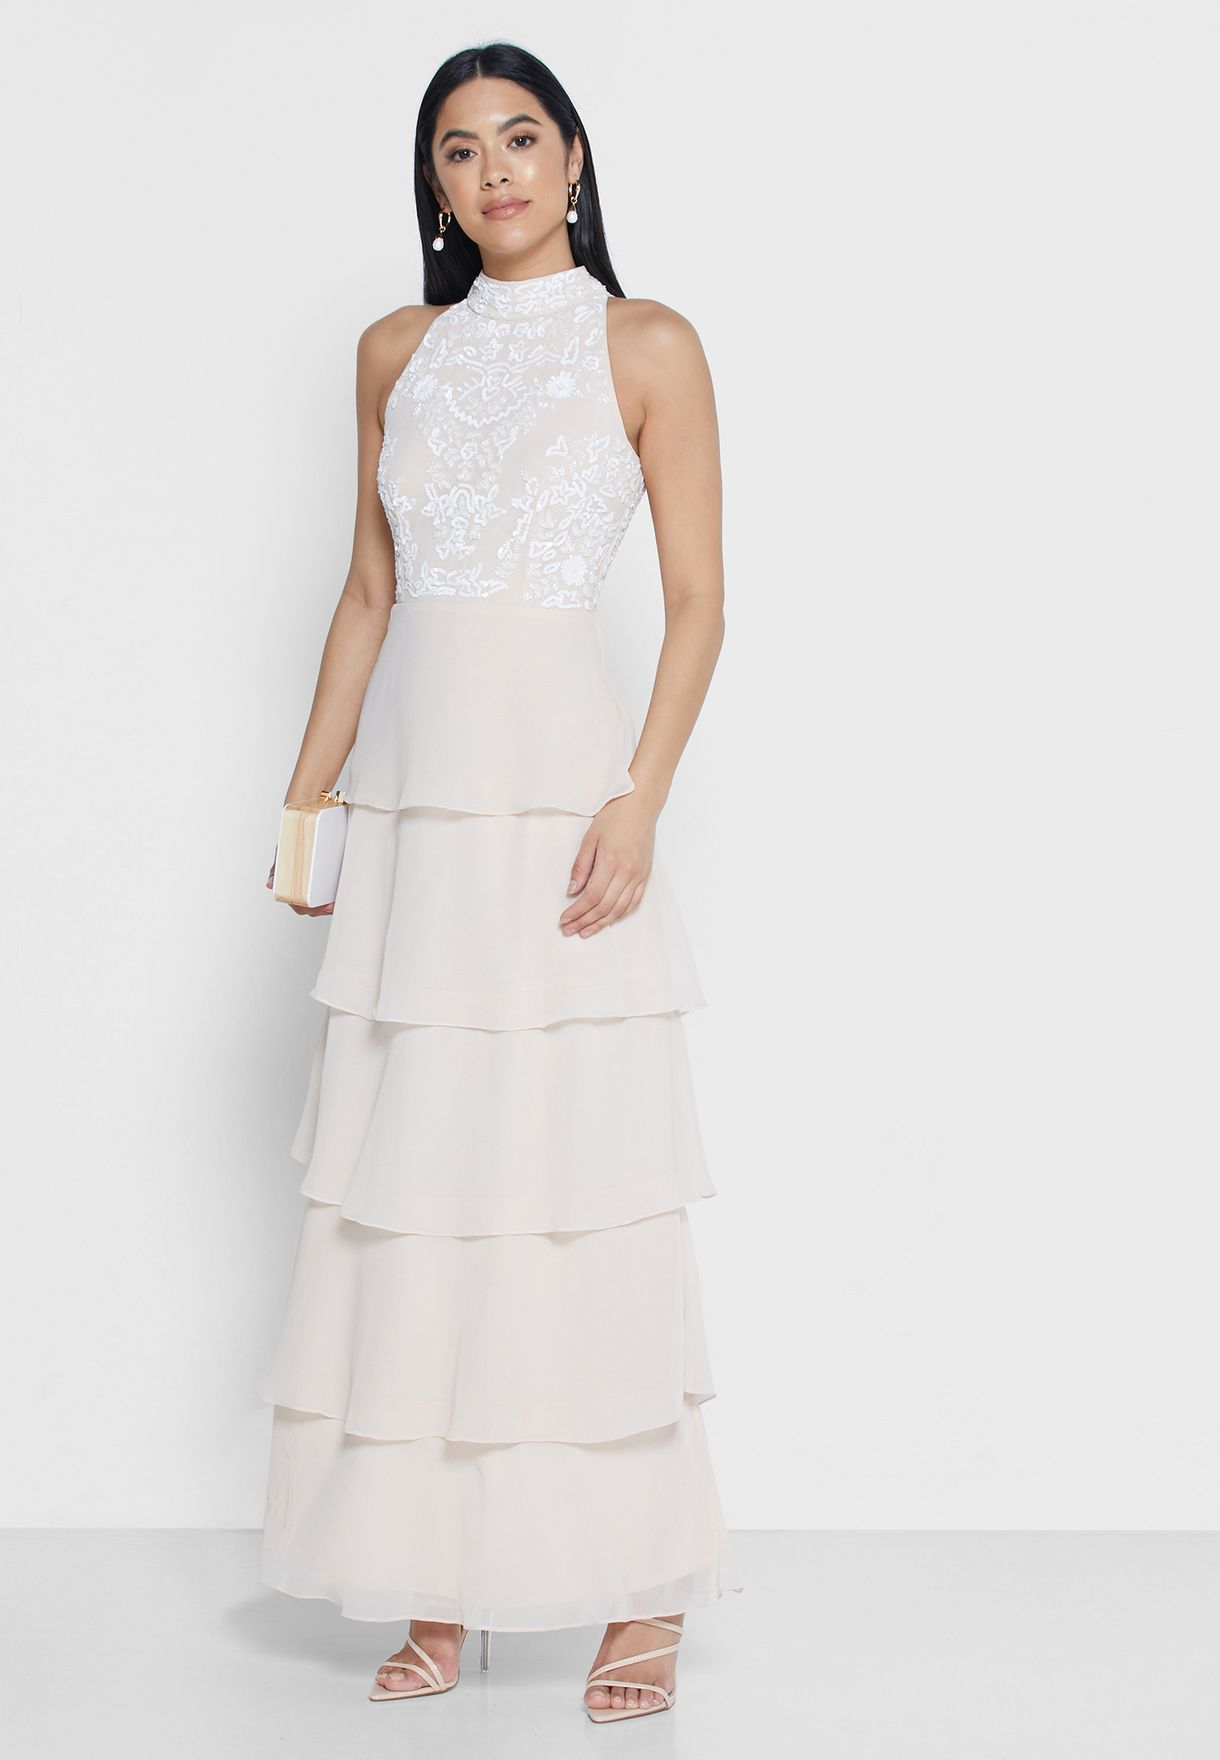 فستان بطبقات مزين بالترتر